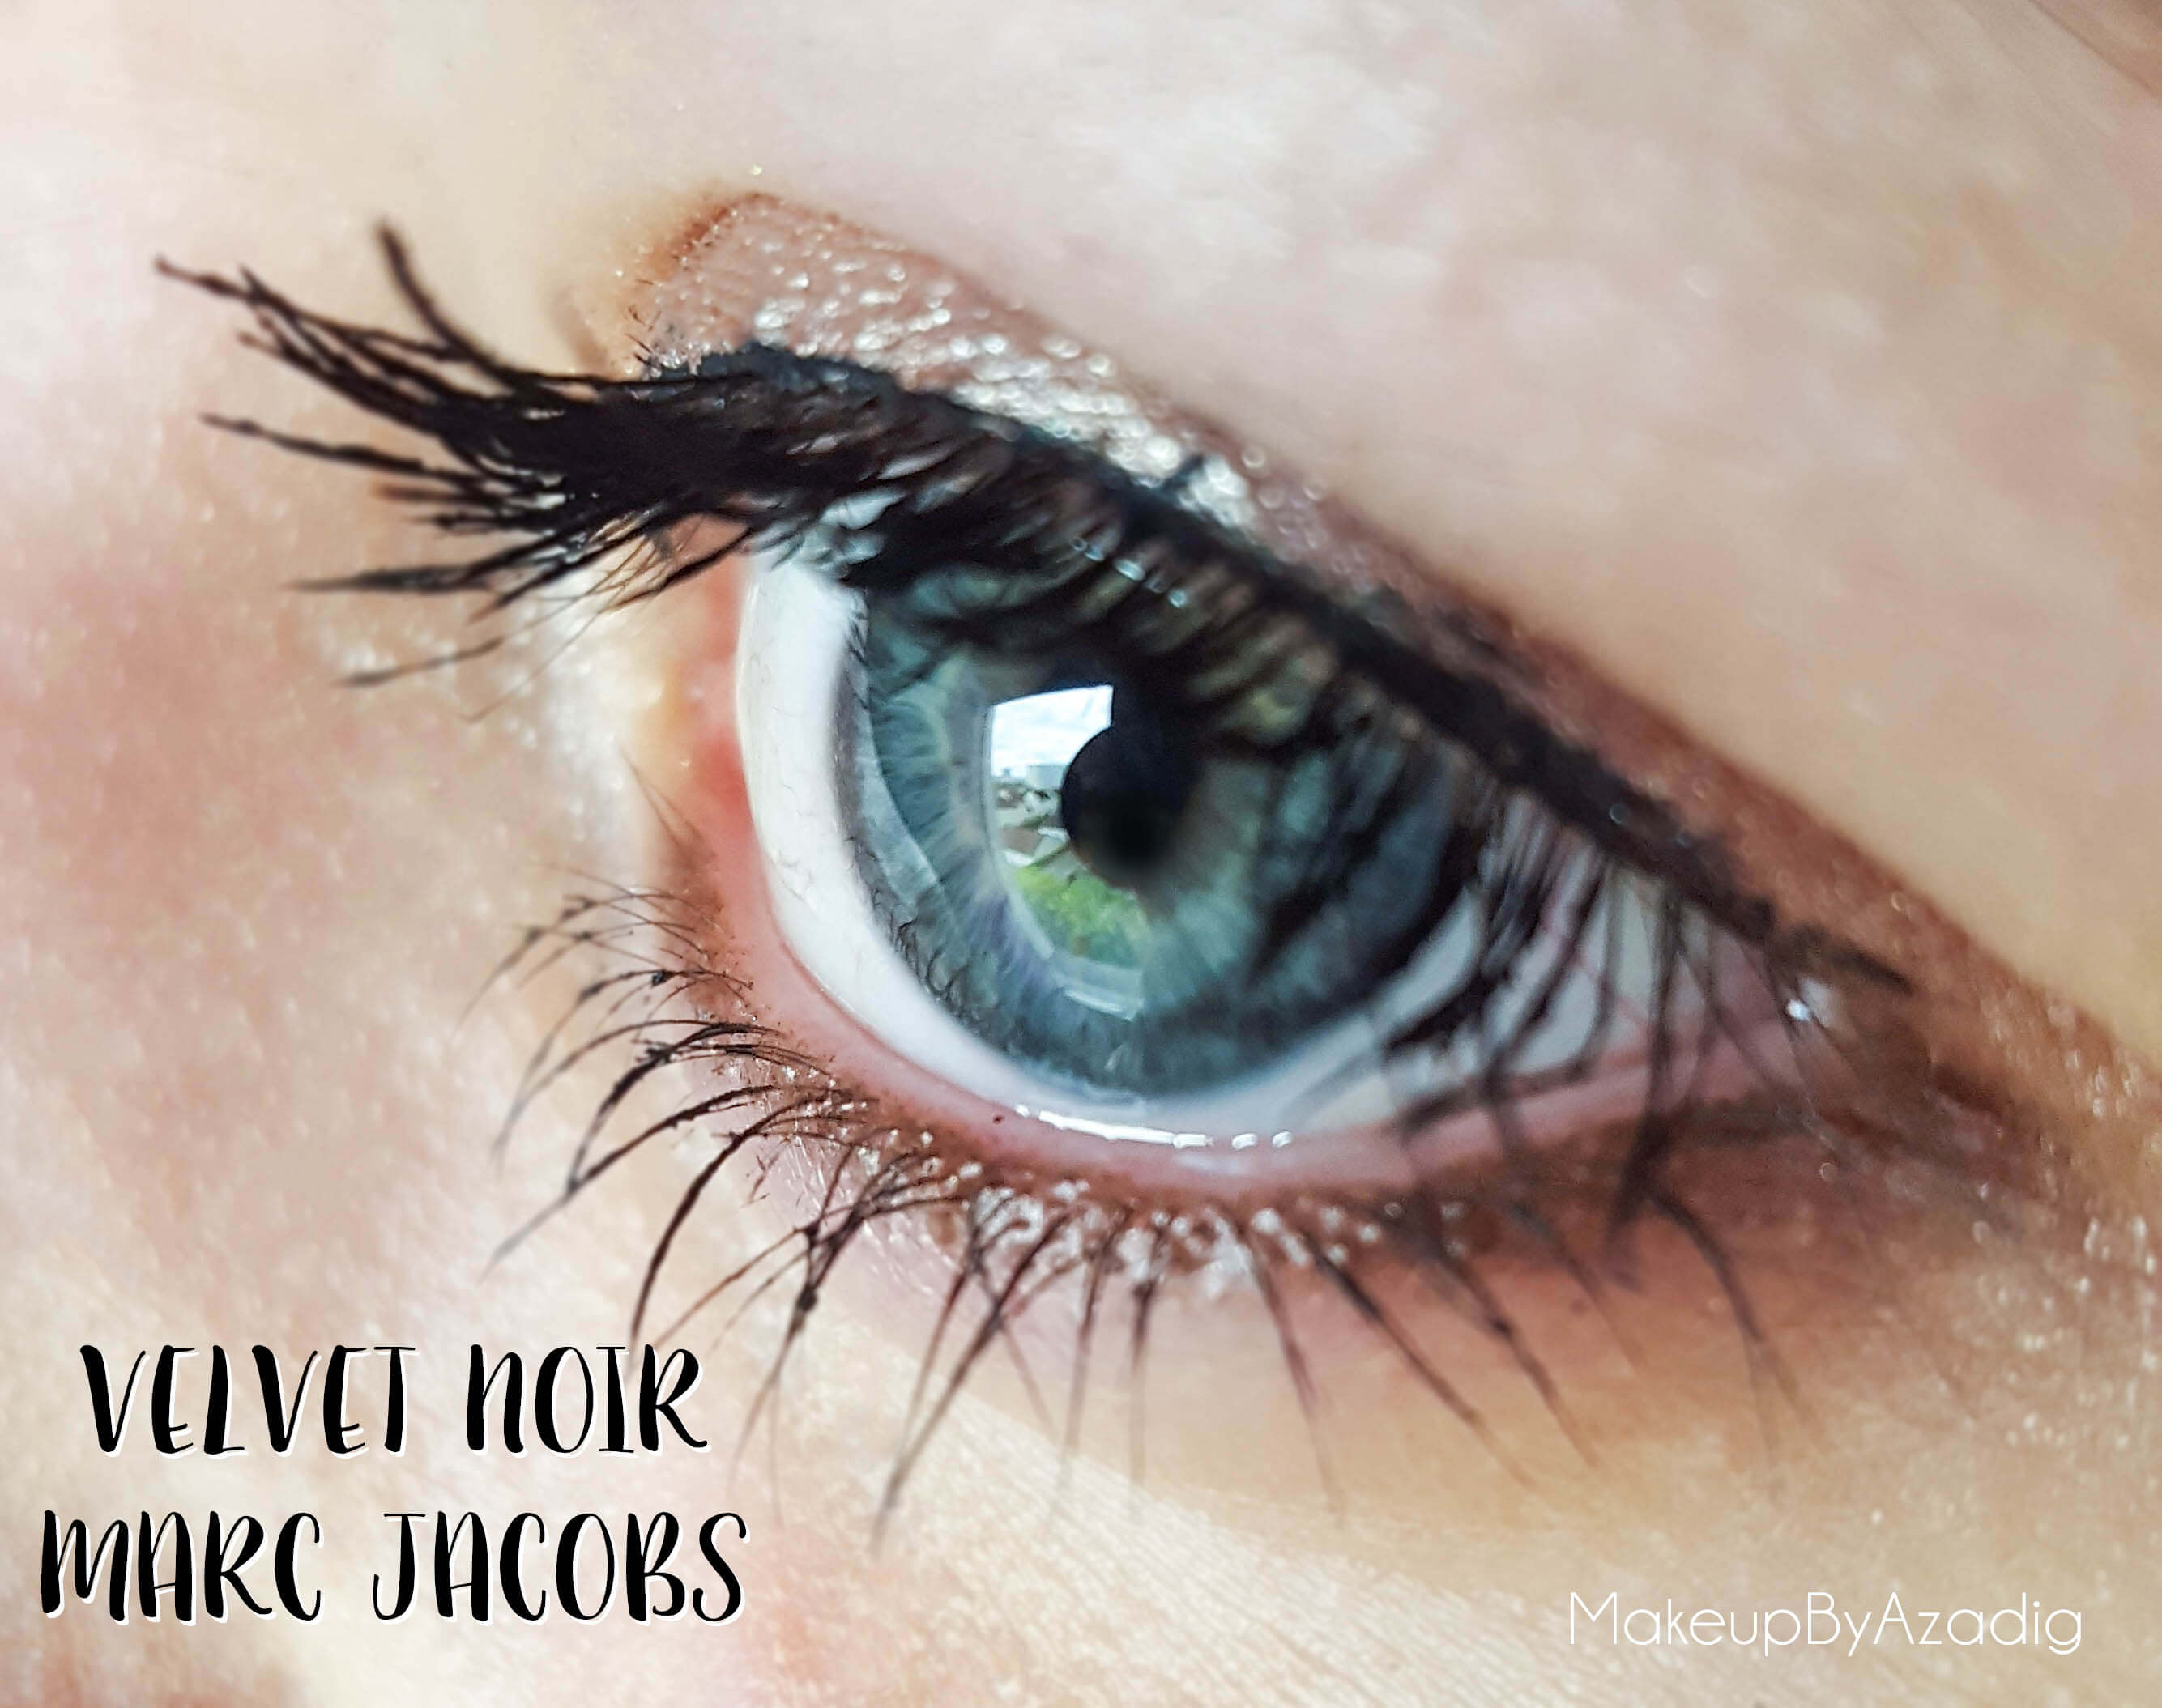 velvet noir-volume spectaculaire-marc jacobs-makeupbyazadig-revue-review-mascara-noir intense-swatches